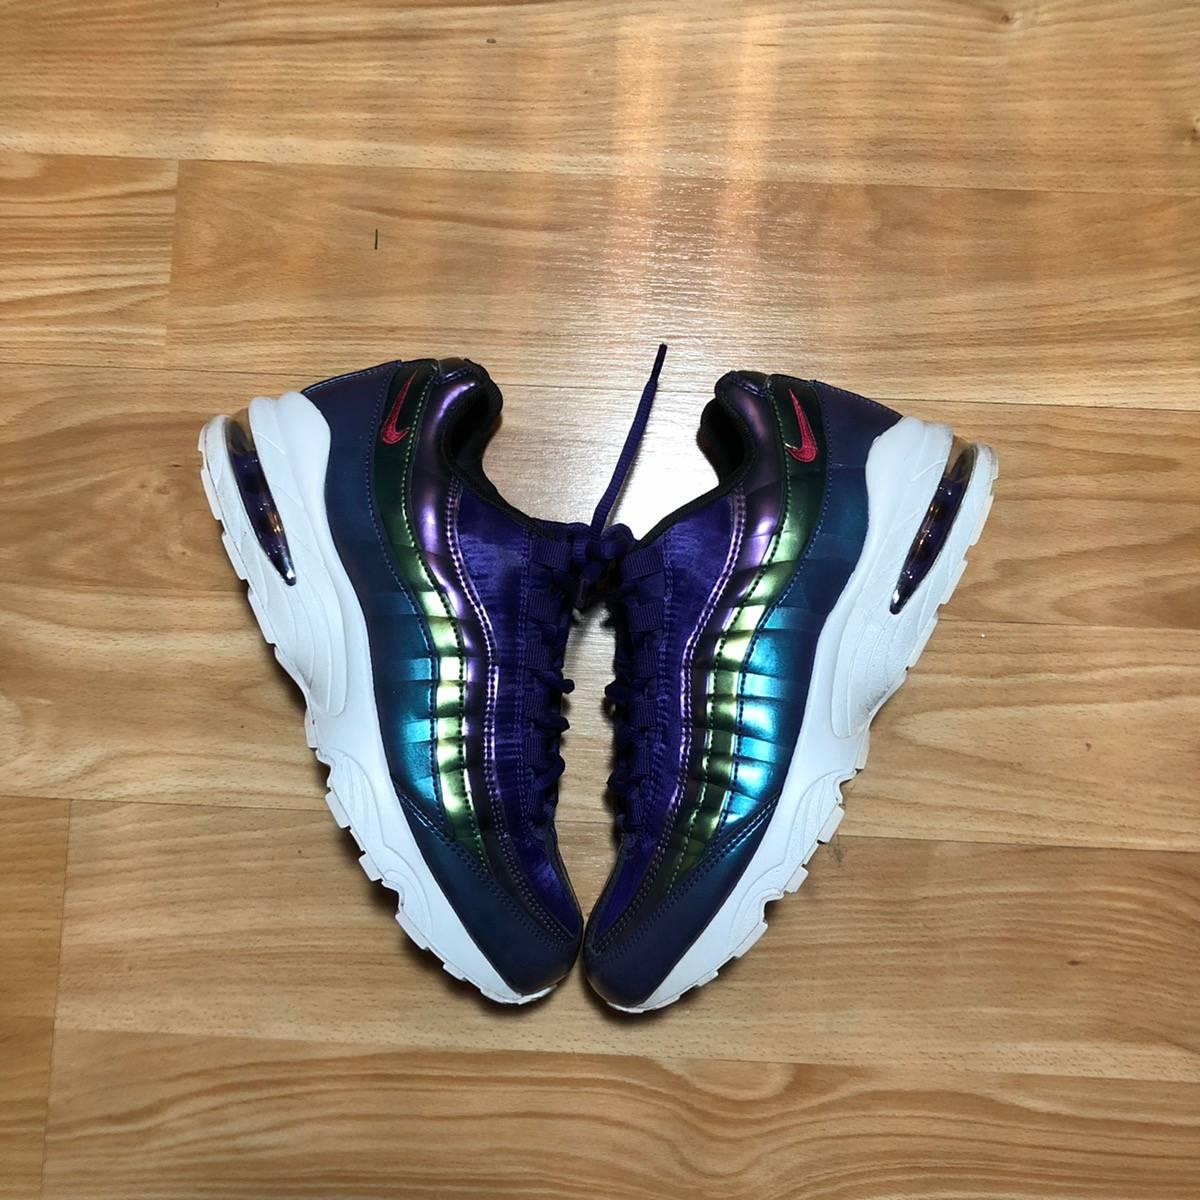 Nike Air Max 95 Women Children Sneakers Purple Size 6.5Y